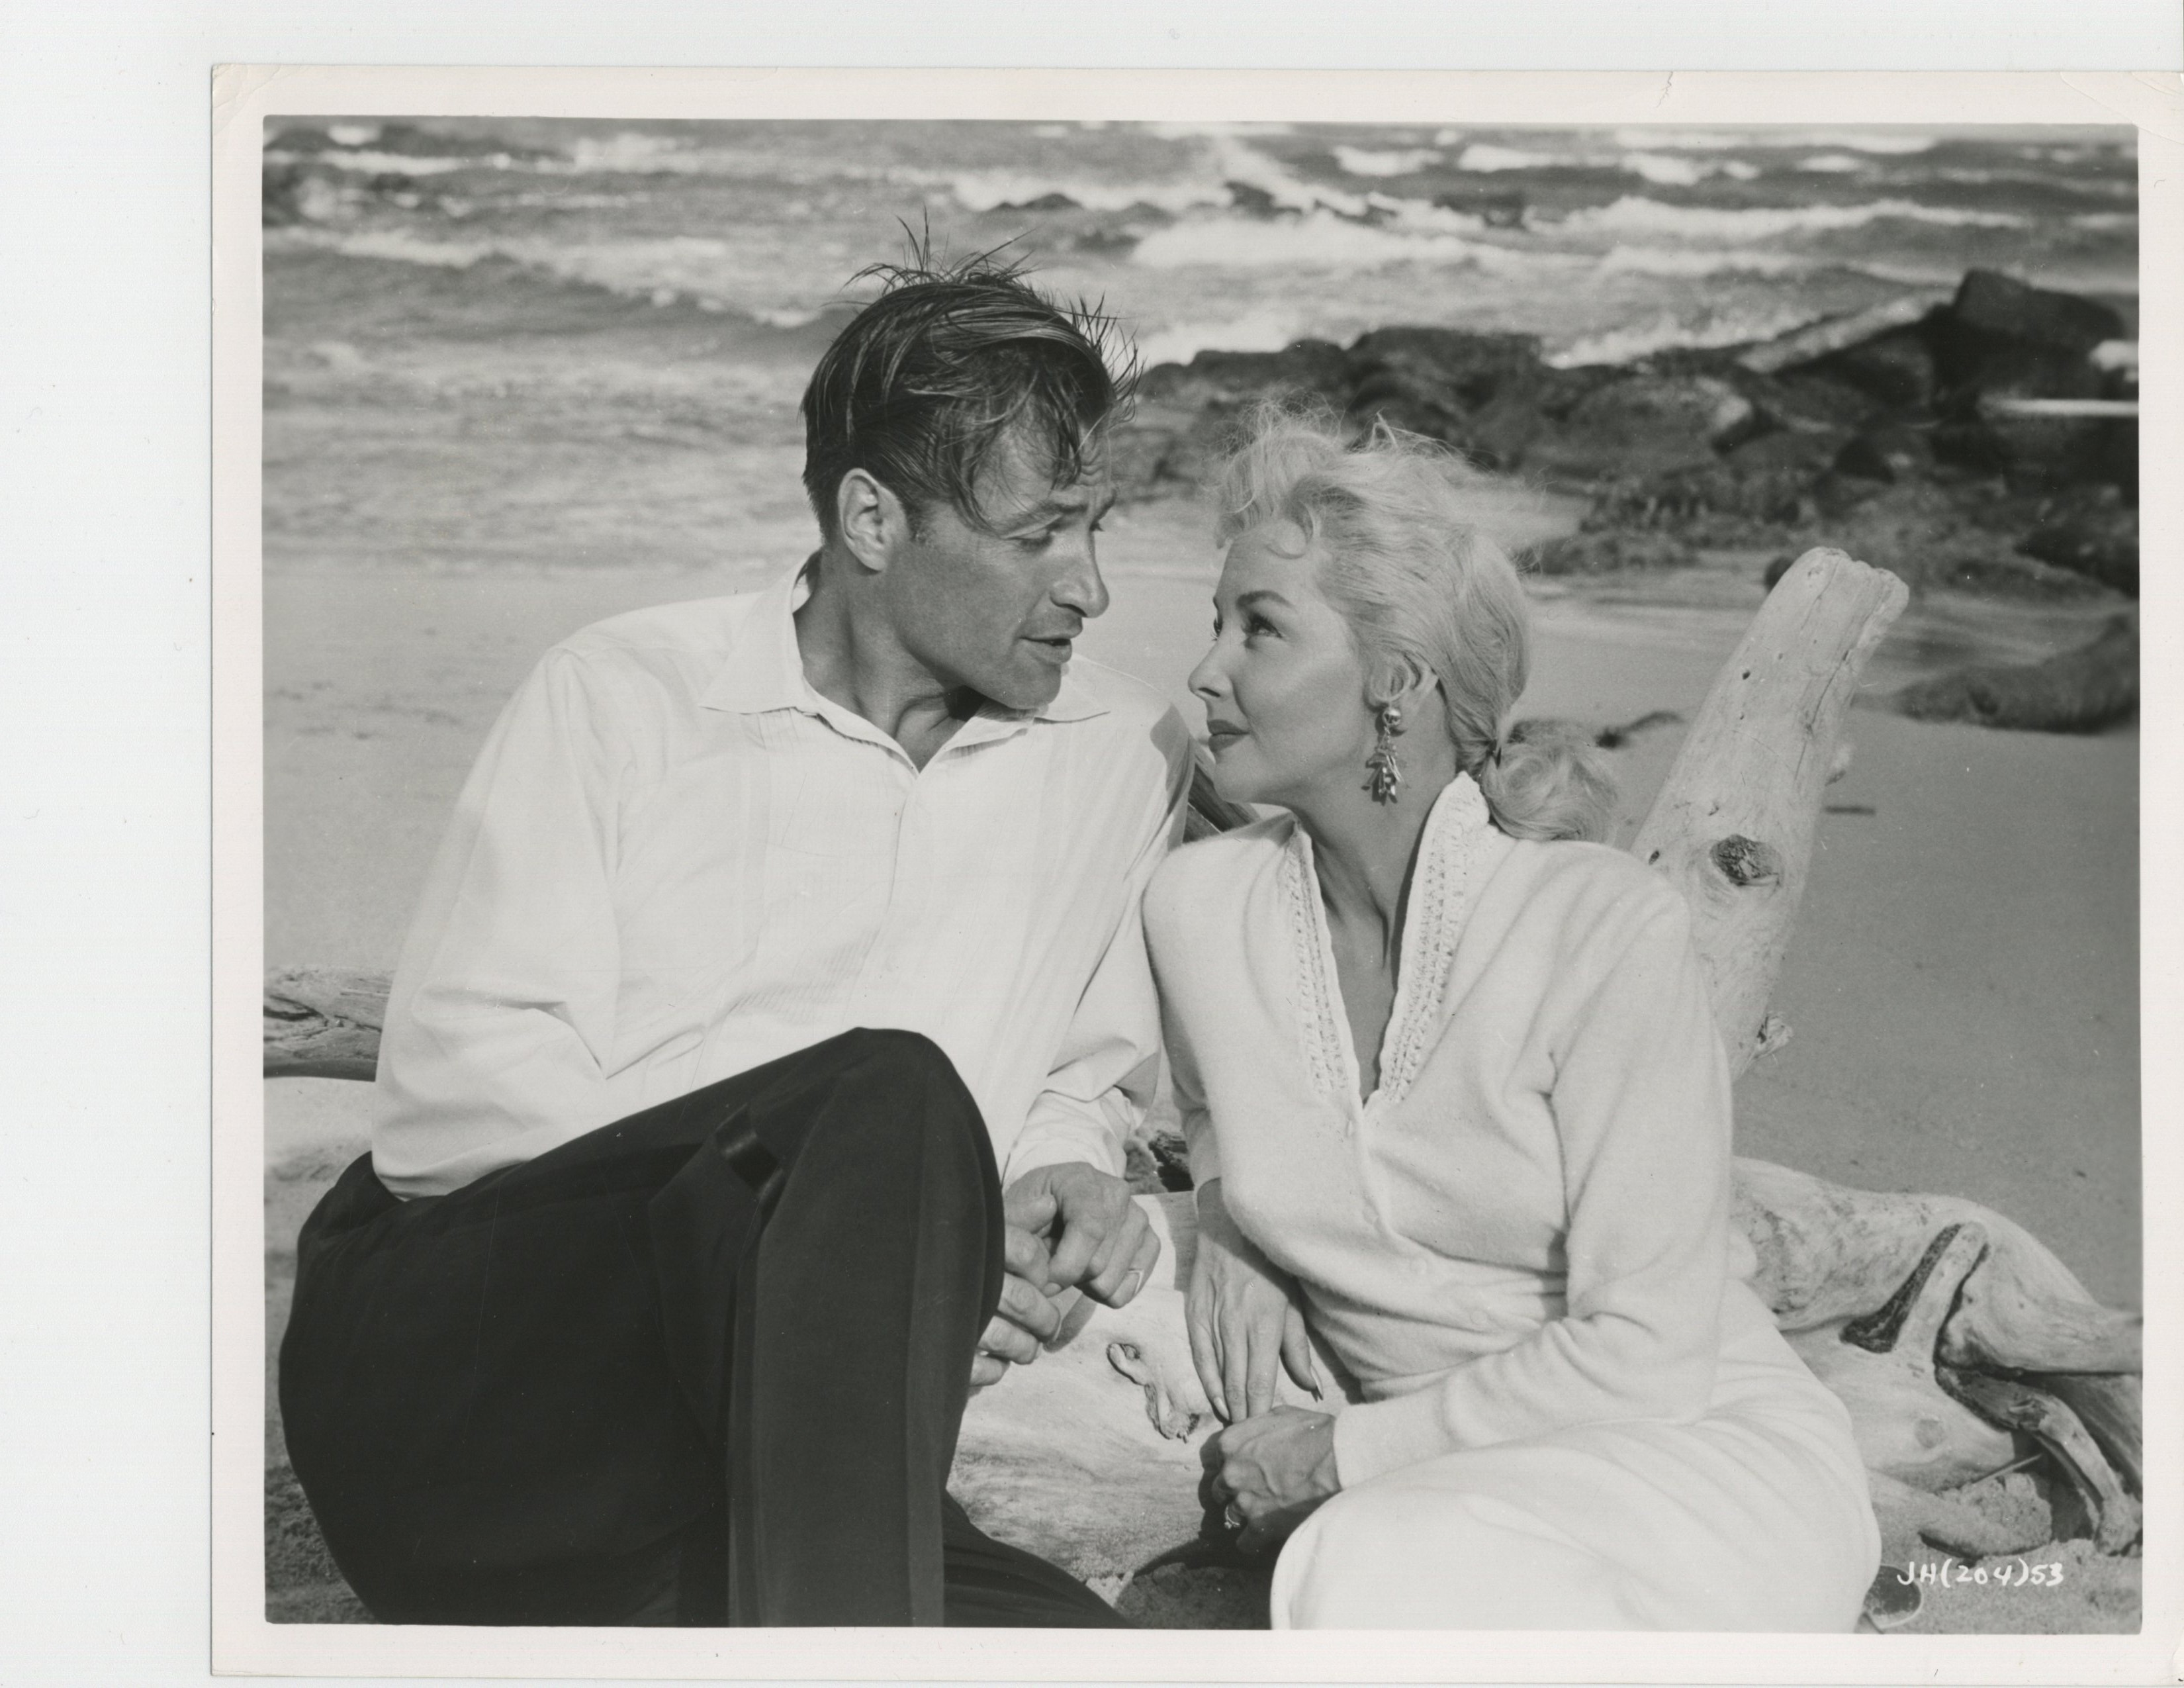 Lex Barker and Mari Blanchard in Jungle Heat (1957)